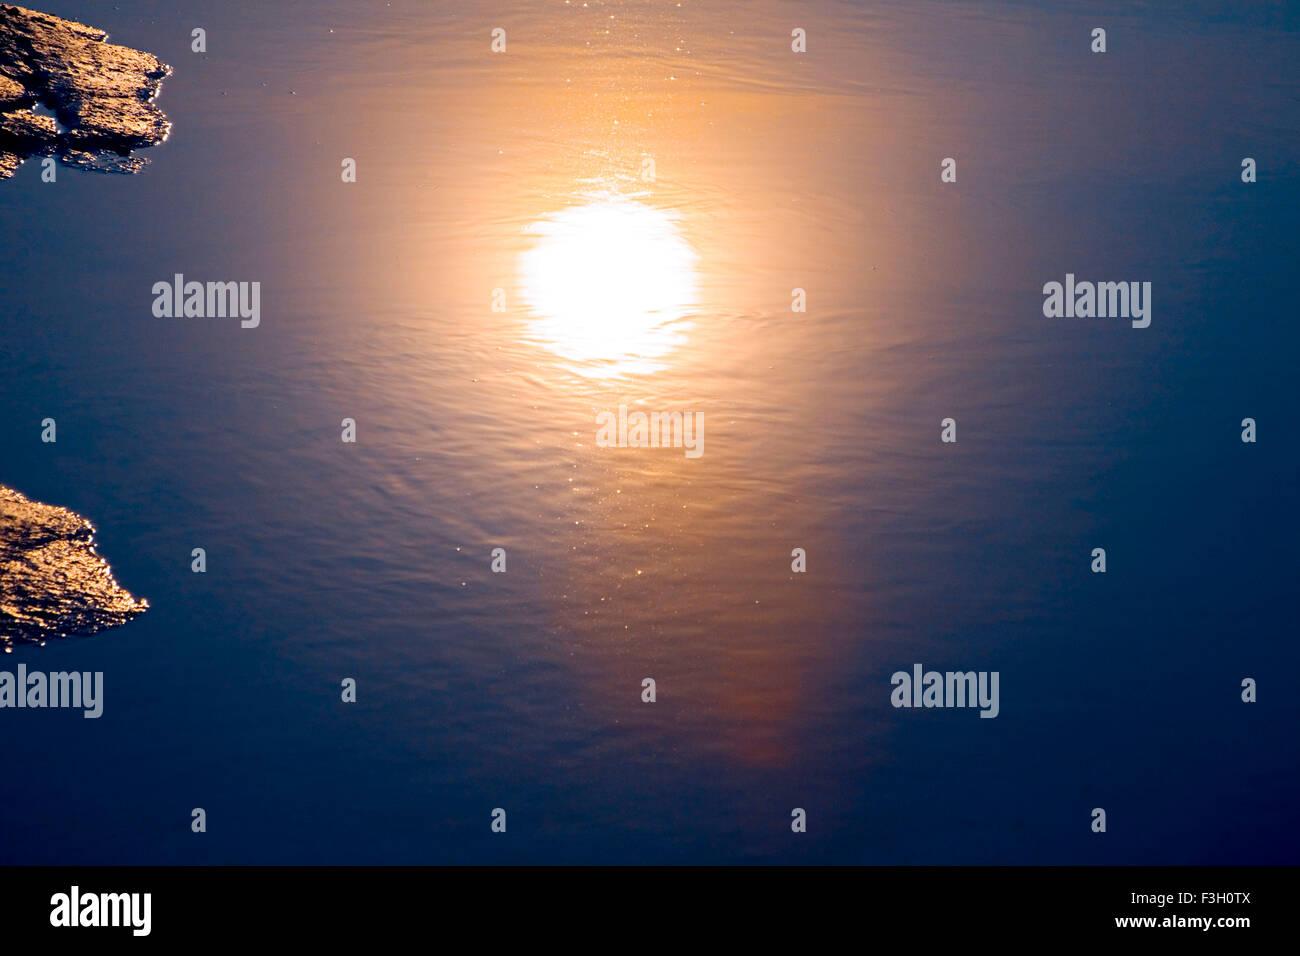 Reflejo del sol en el agua del mar la fotografía artística ; Aksa Malad beach ; ; ; ; Maharashtra Bombay Bombay India Foto de stock